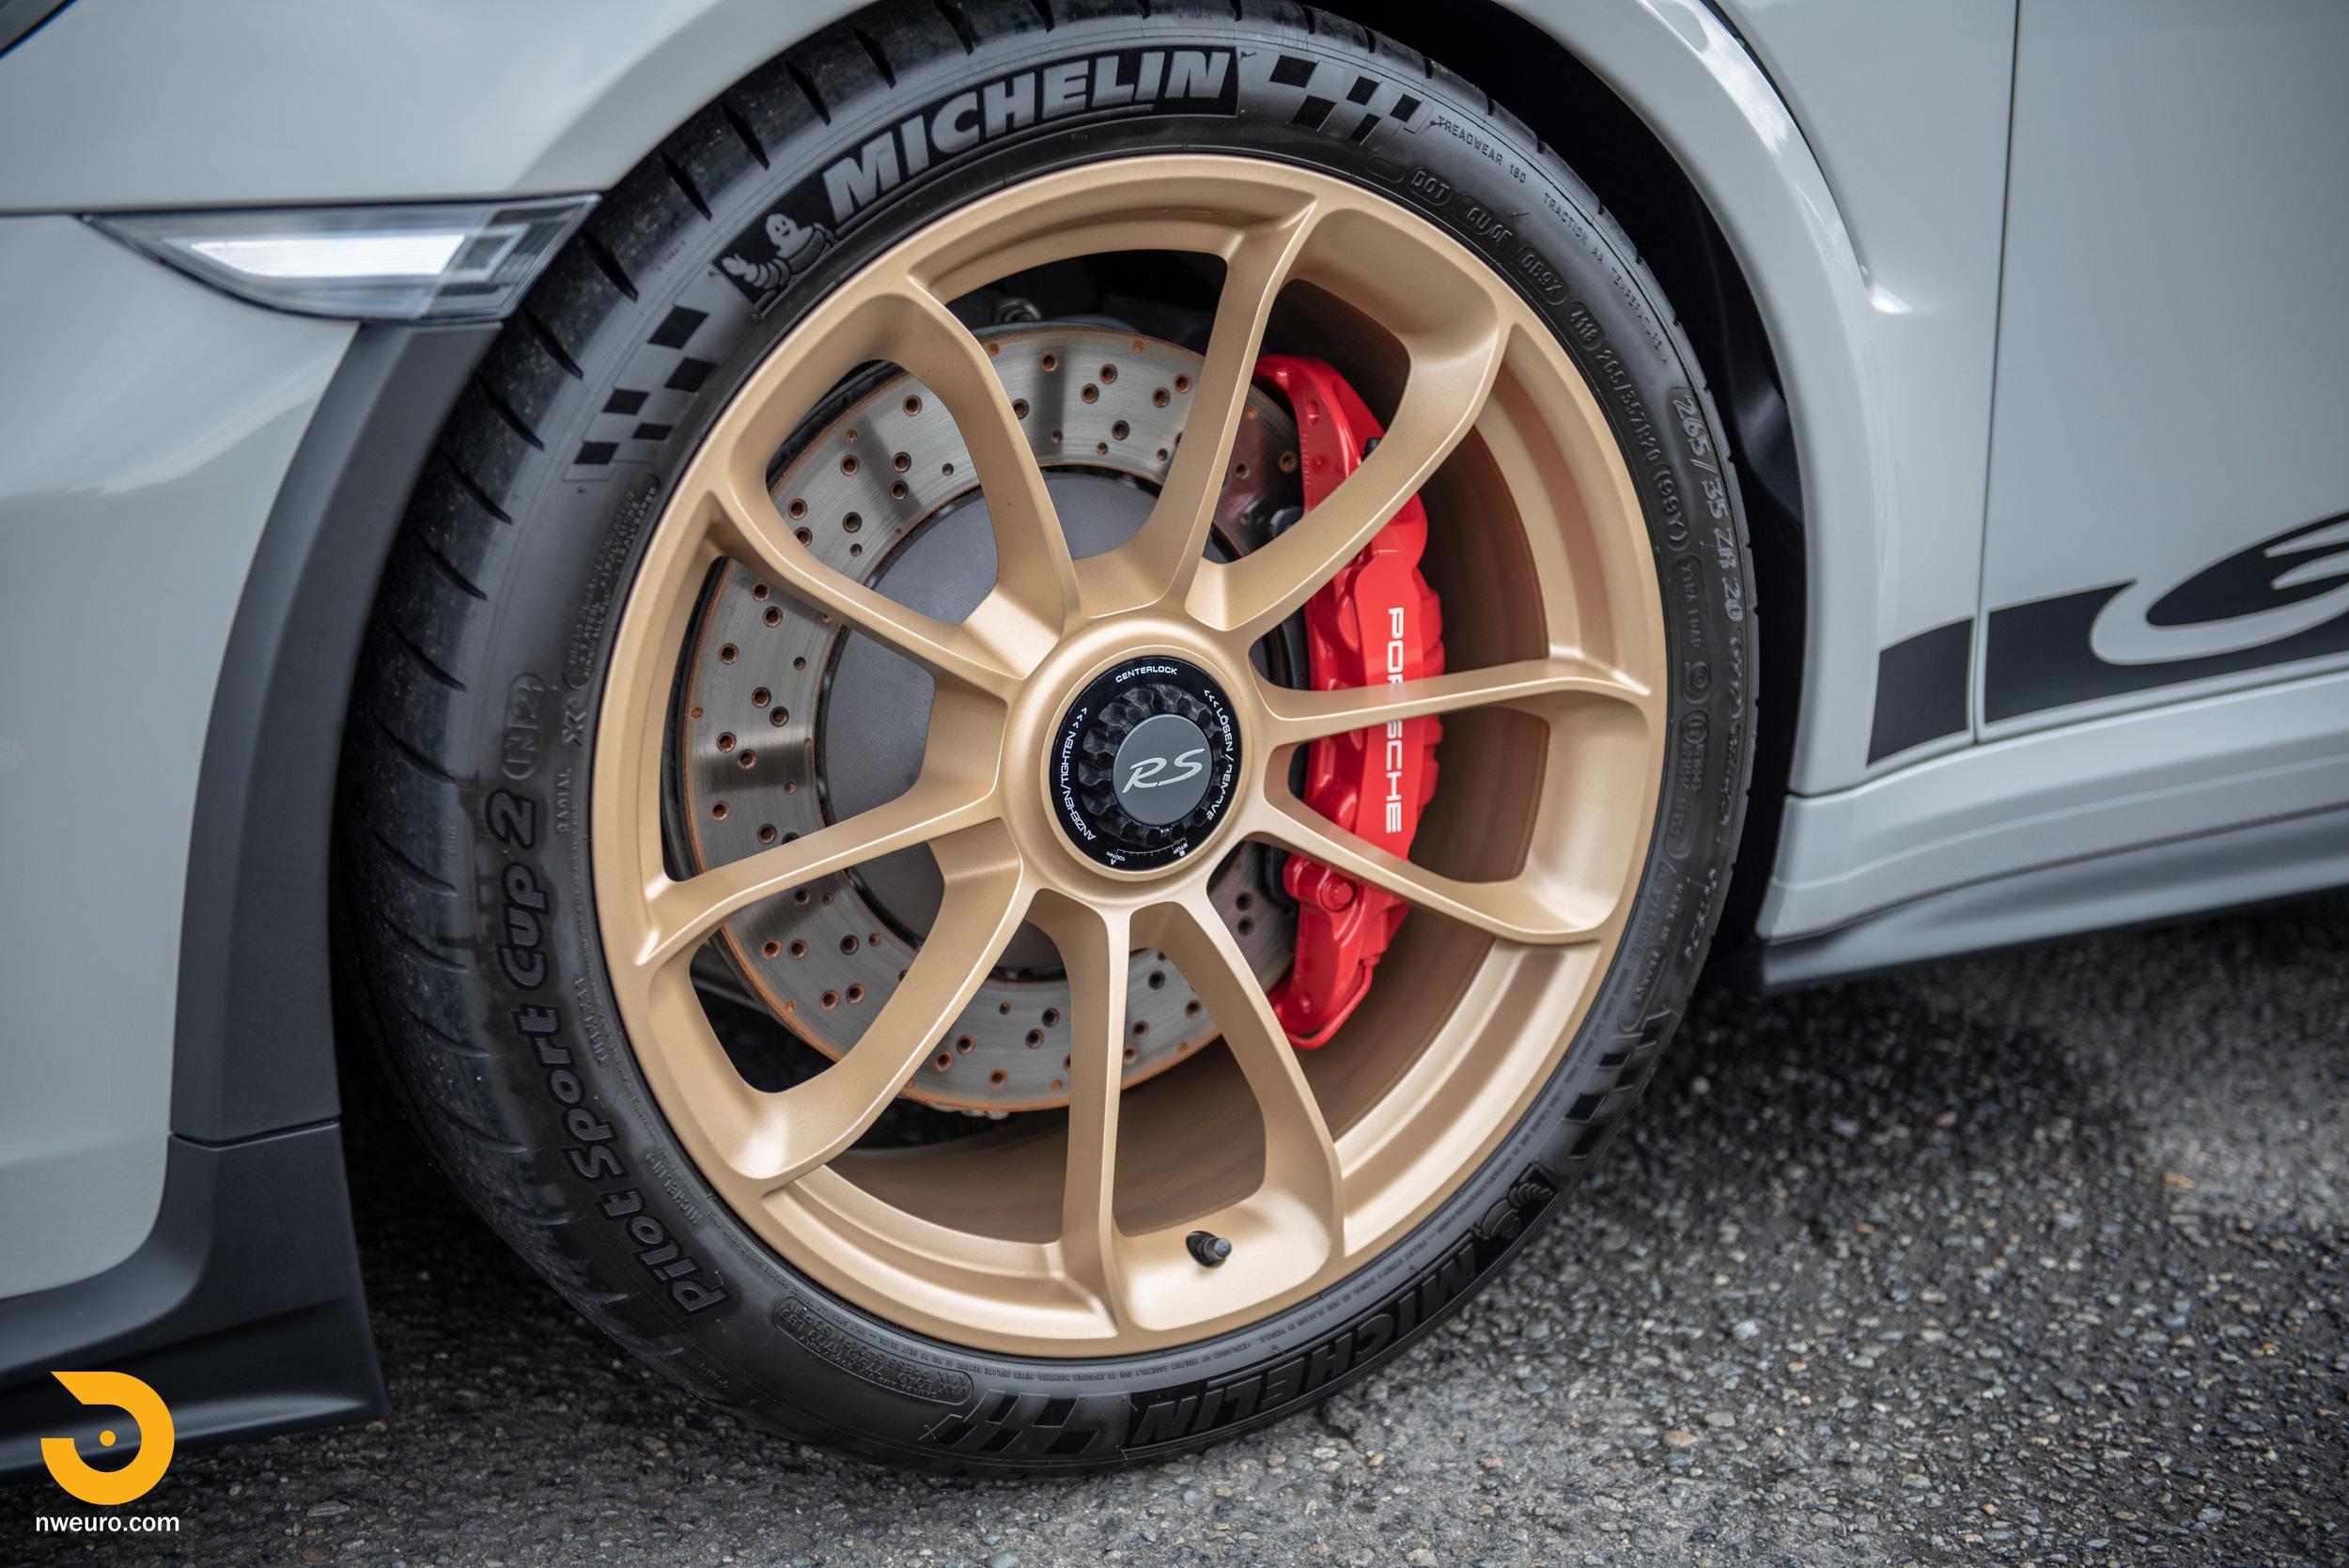 2019 Porsche GT3 RS - Chalk-22.jpg